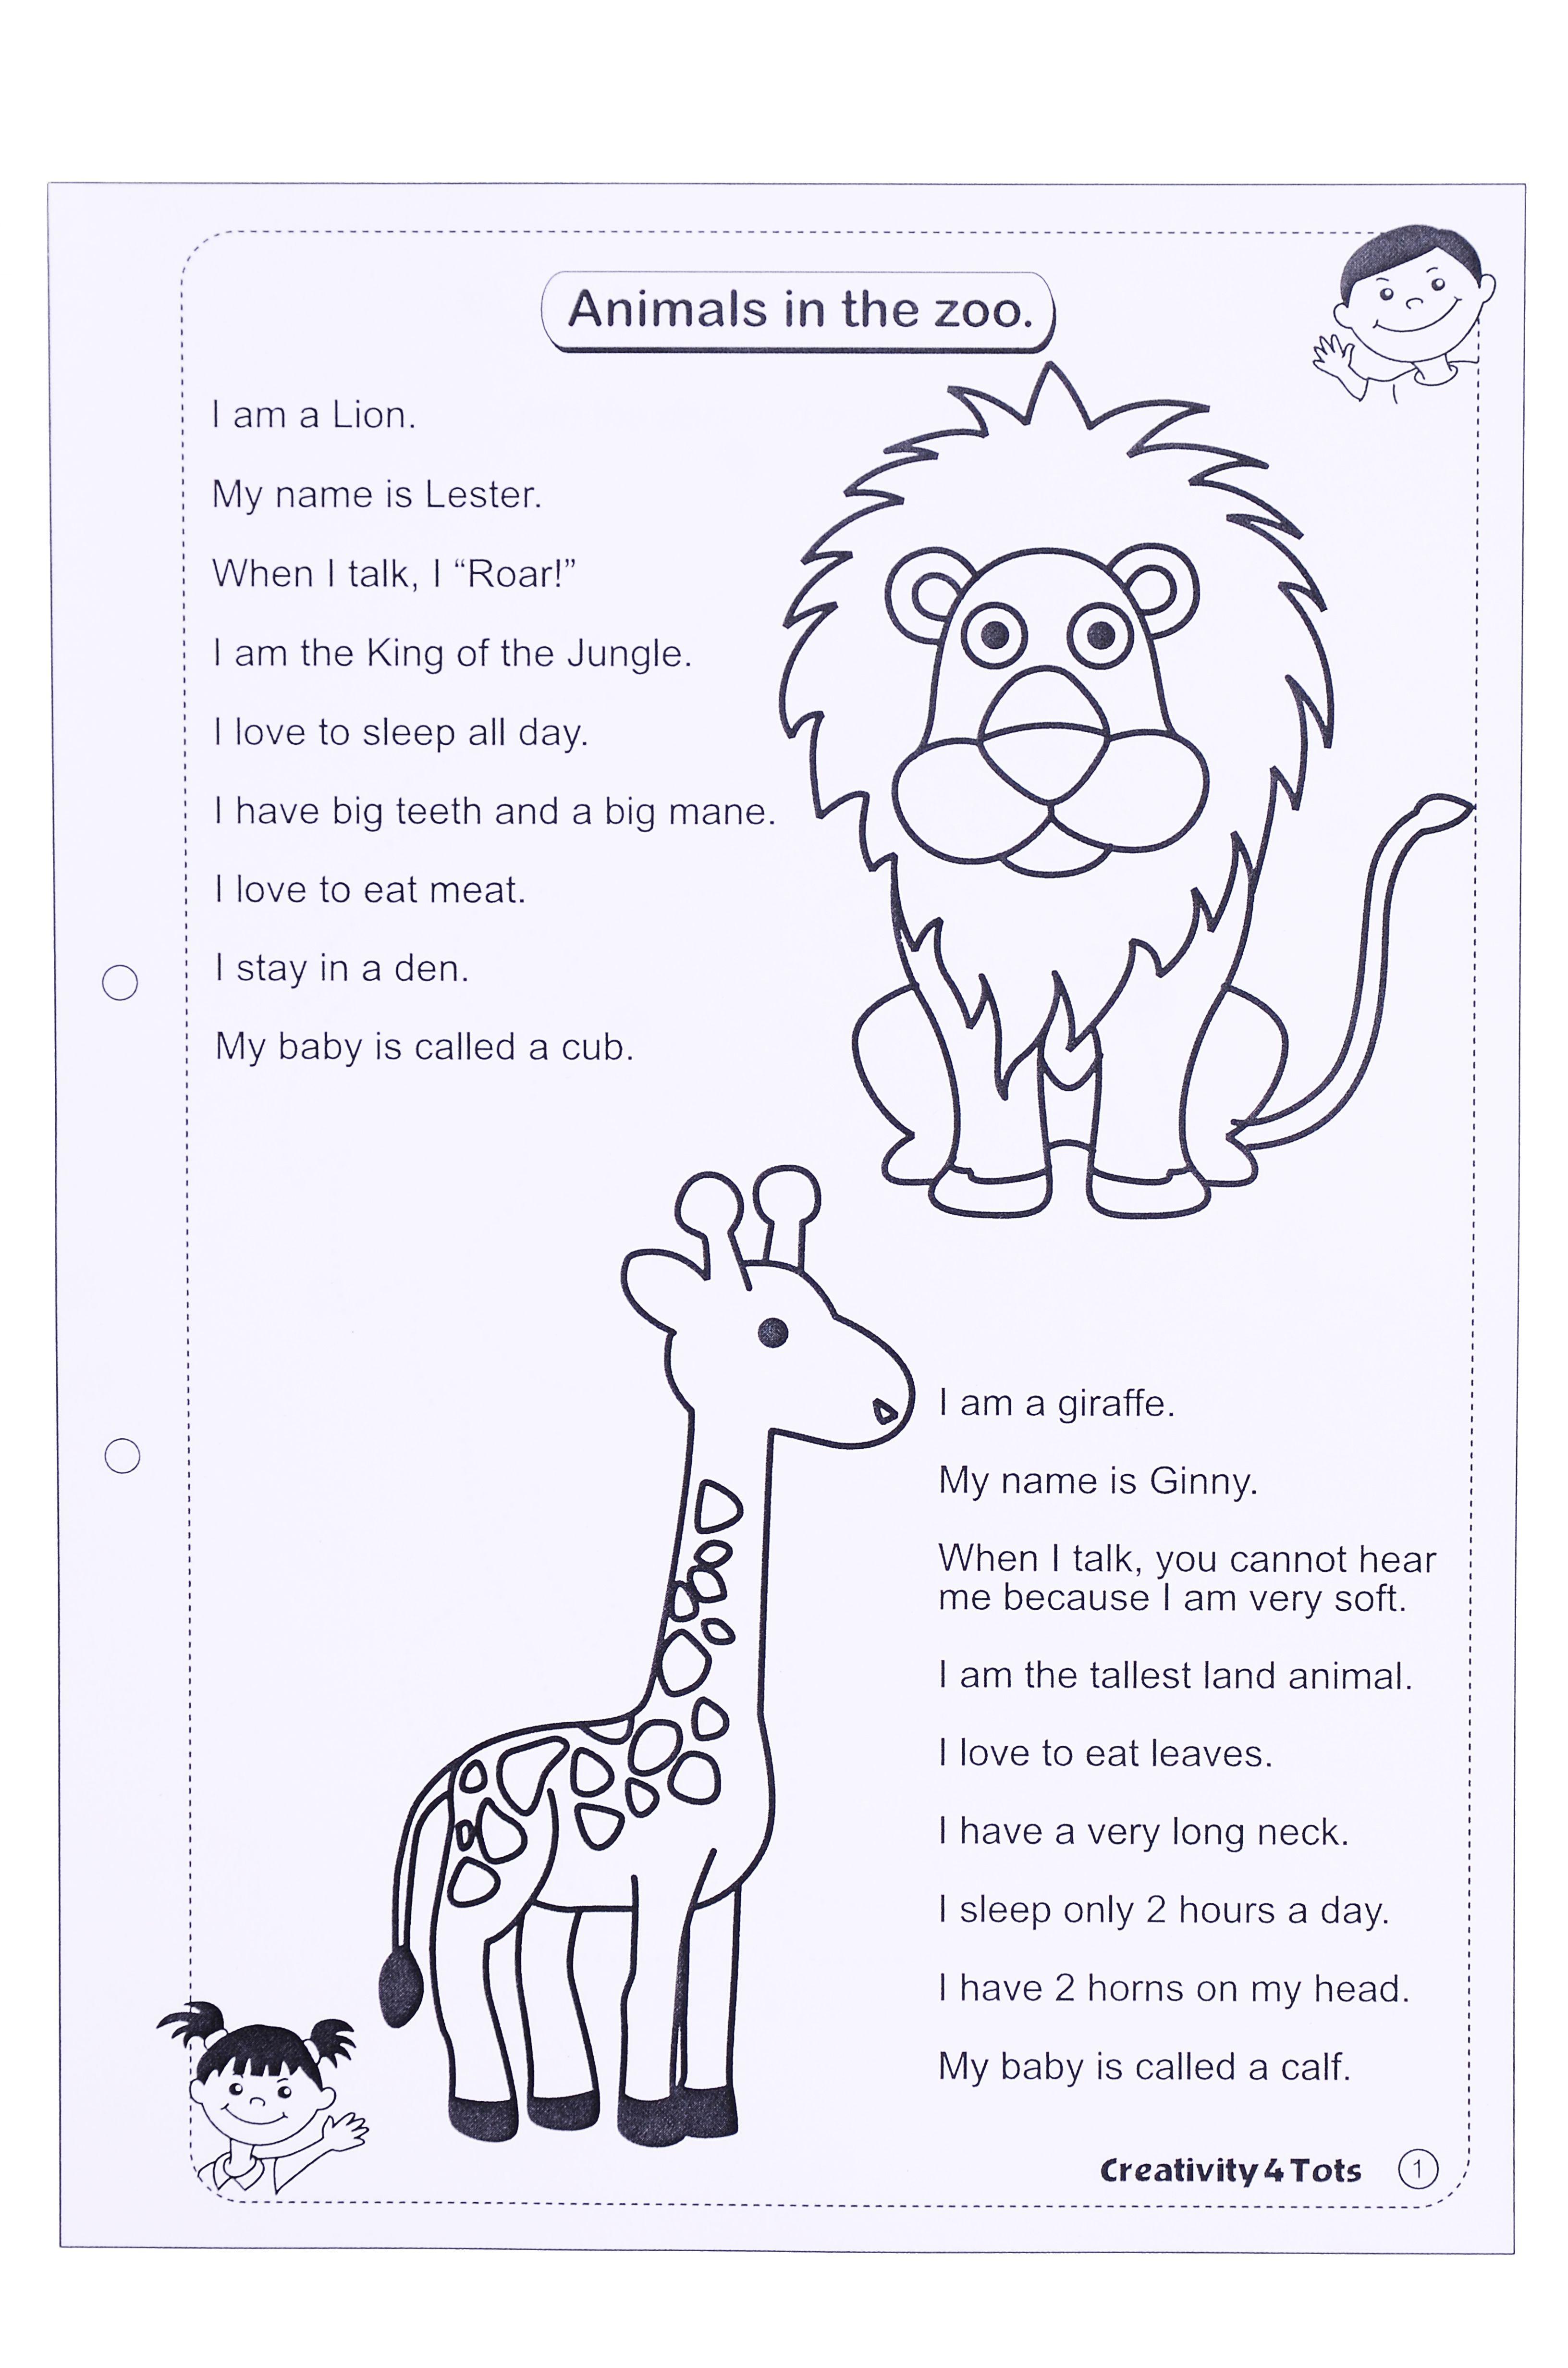 Zoo Animals Worksheet - This Worksheet Is Designed To Teach The - Free Printable Zoo Worksheets